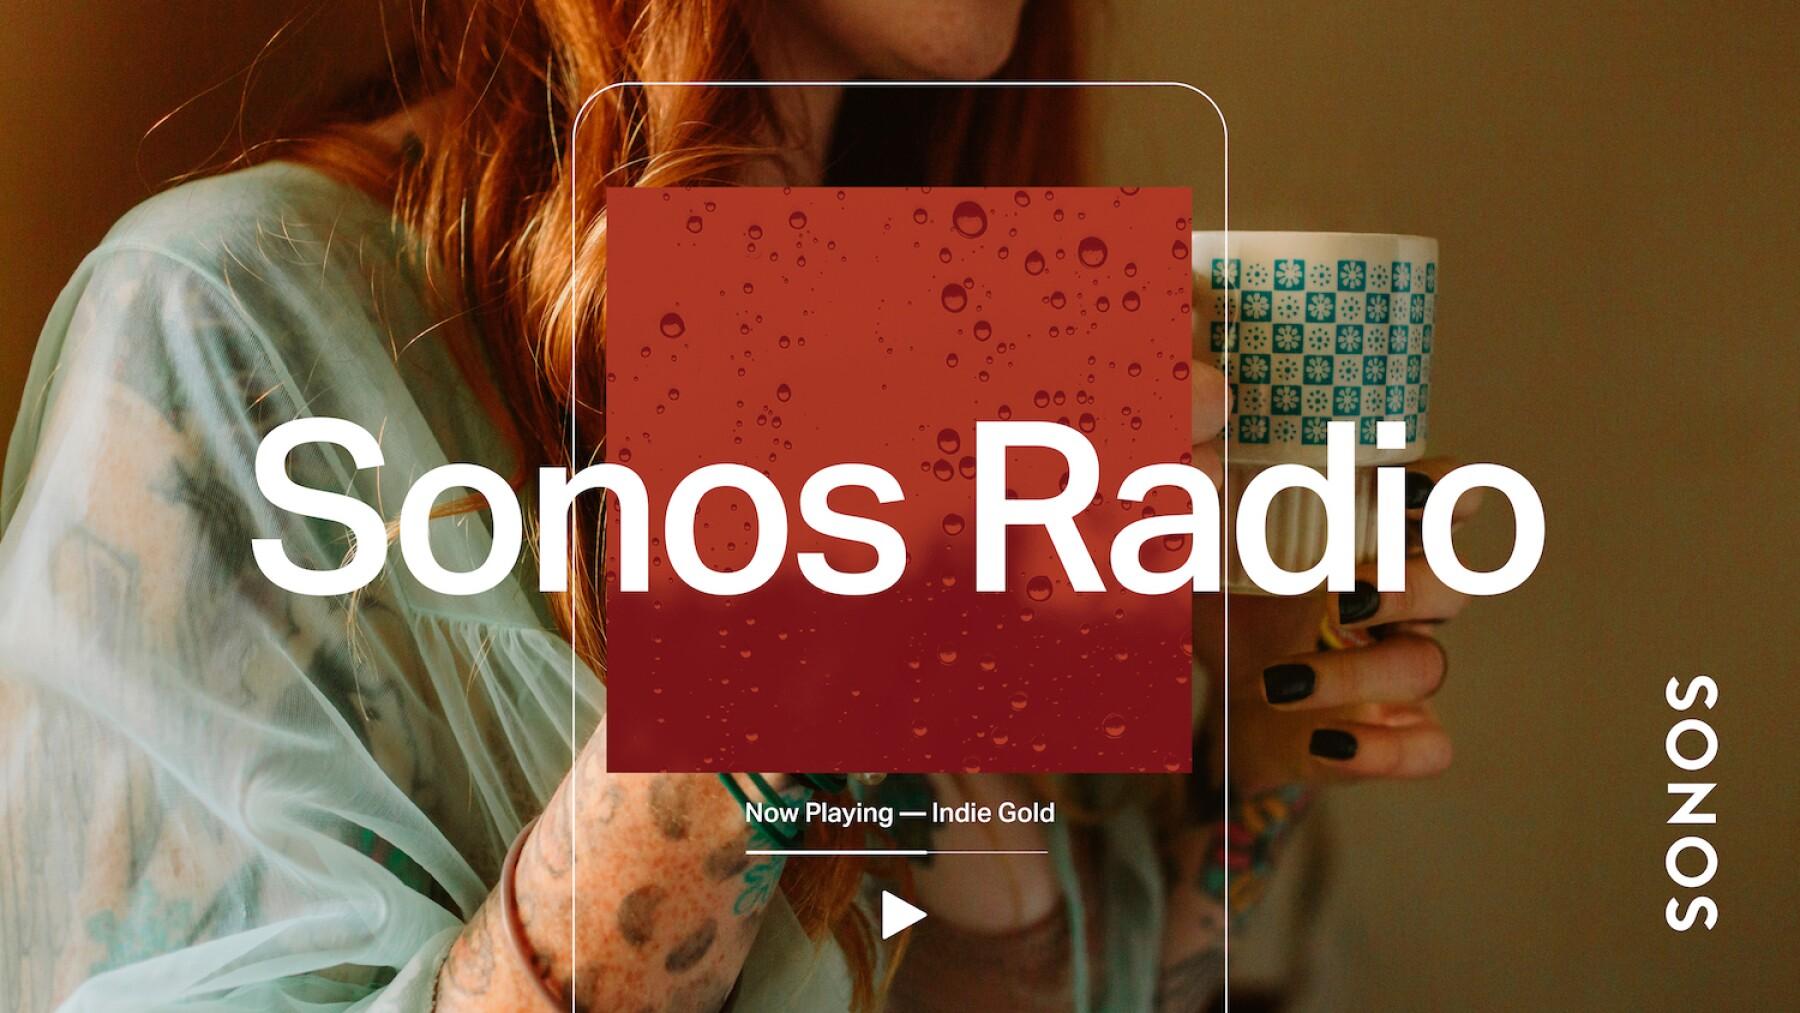 Sonos lanza Sonos Radio a nivel global